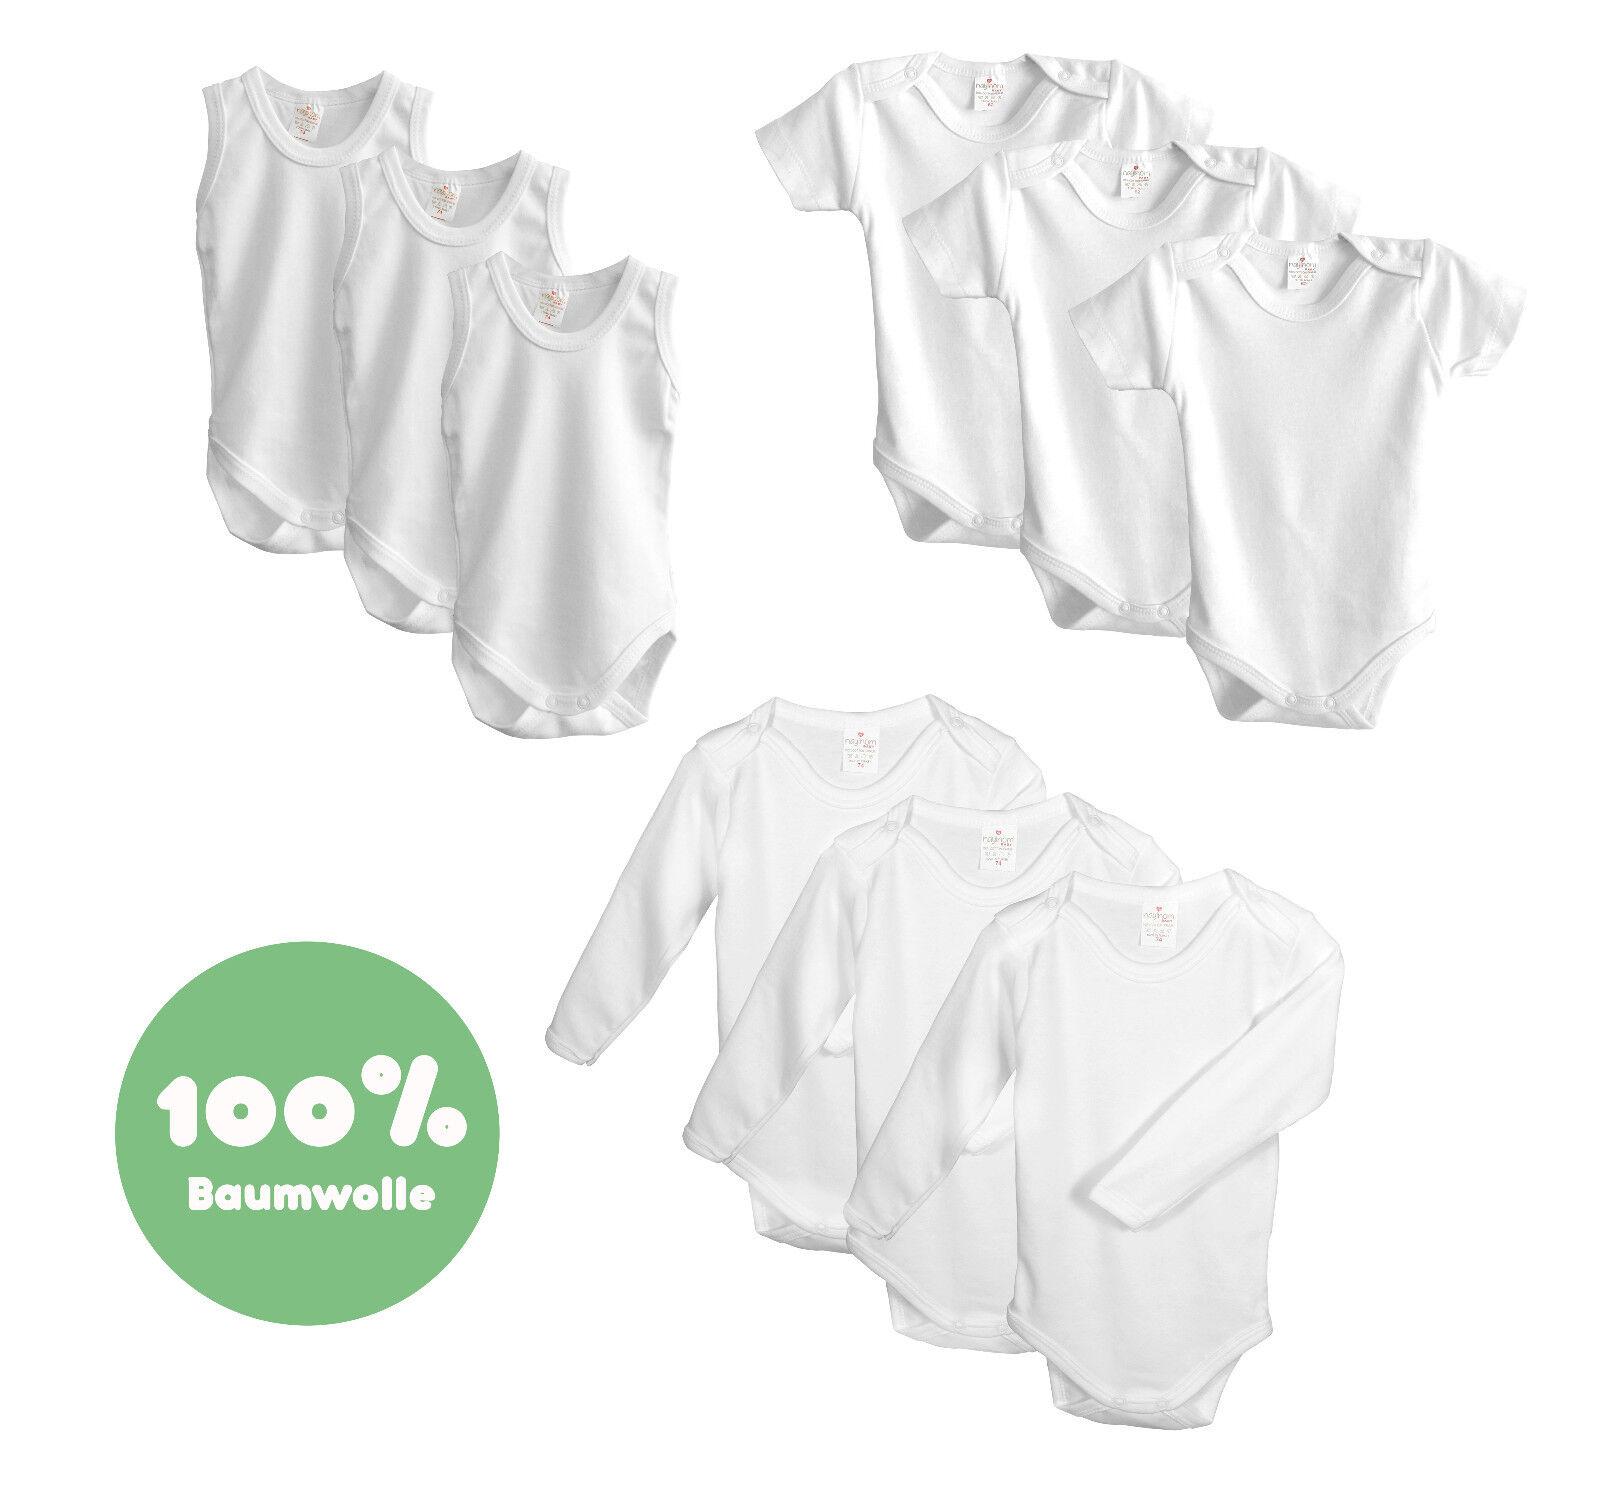 Baby Body 3er Set Pack Weiß Langarm Kurzarm Ärmellos 56/62/68/74/80/86/92/98